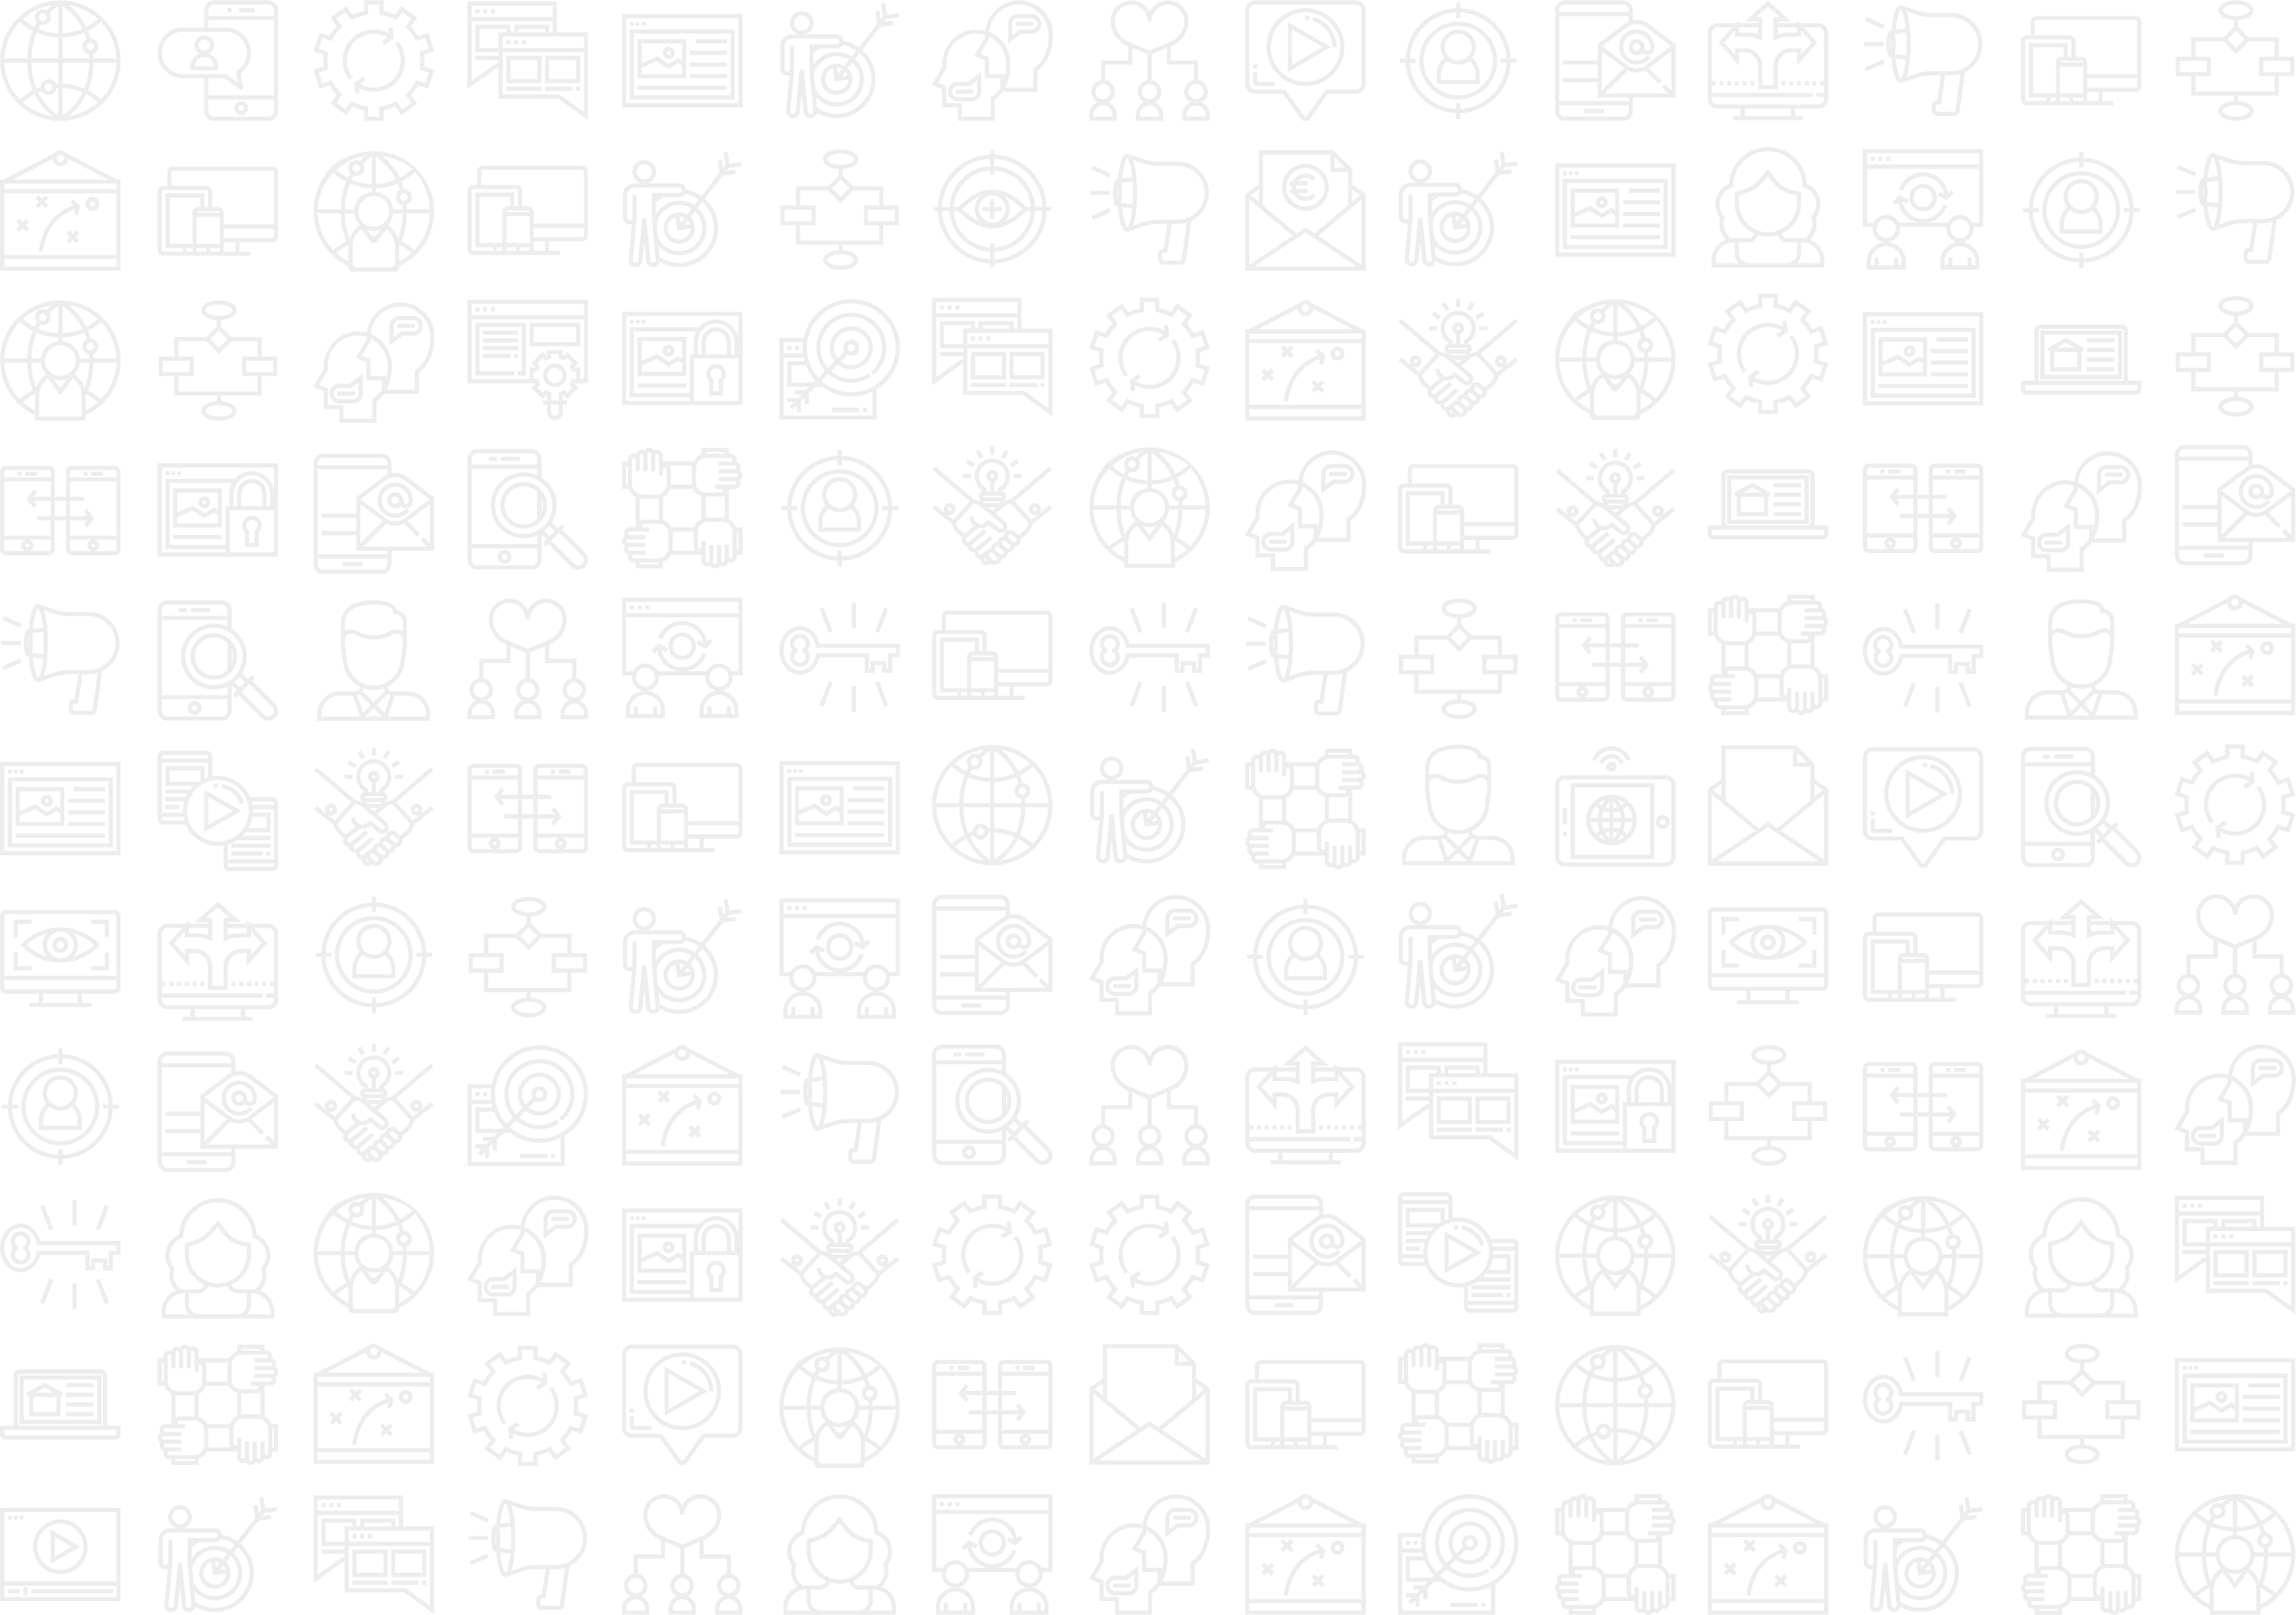 Background_Icons